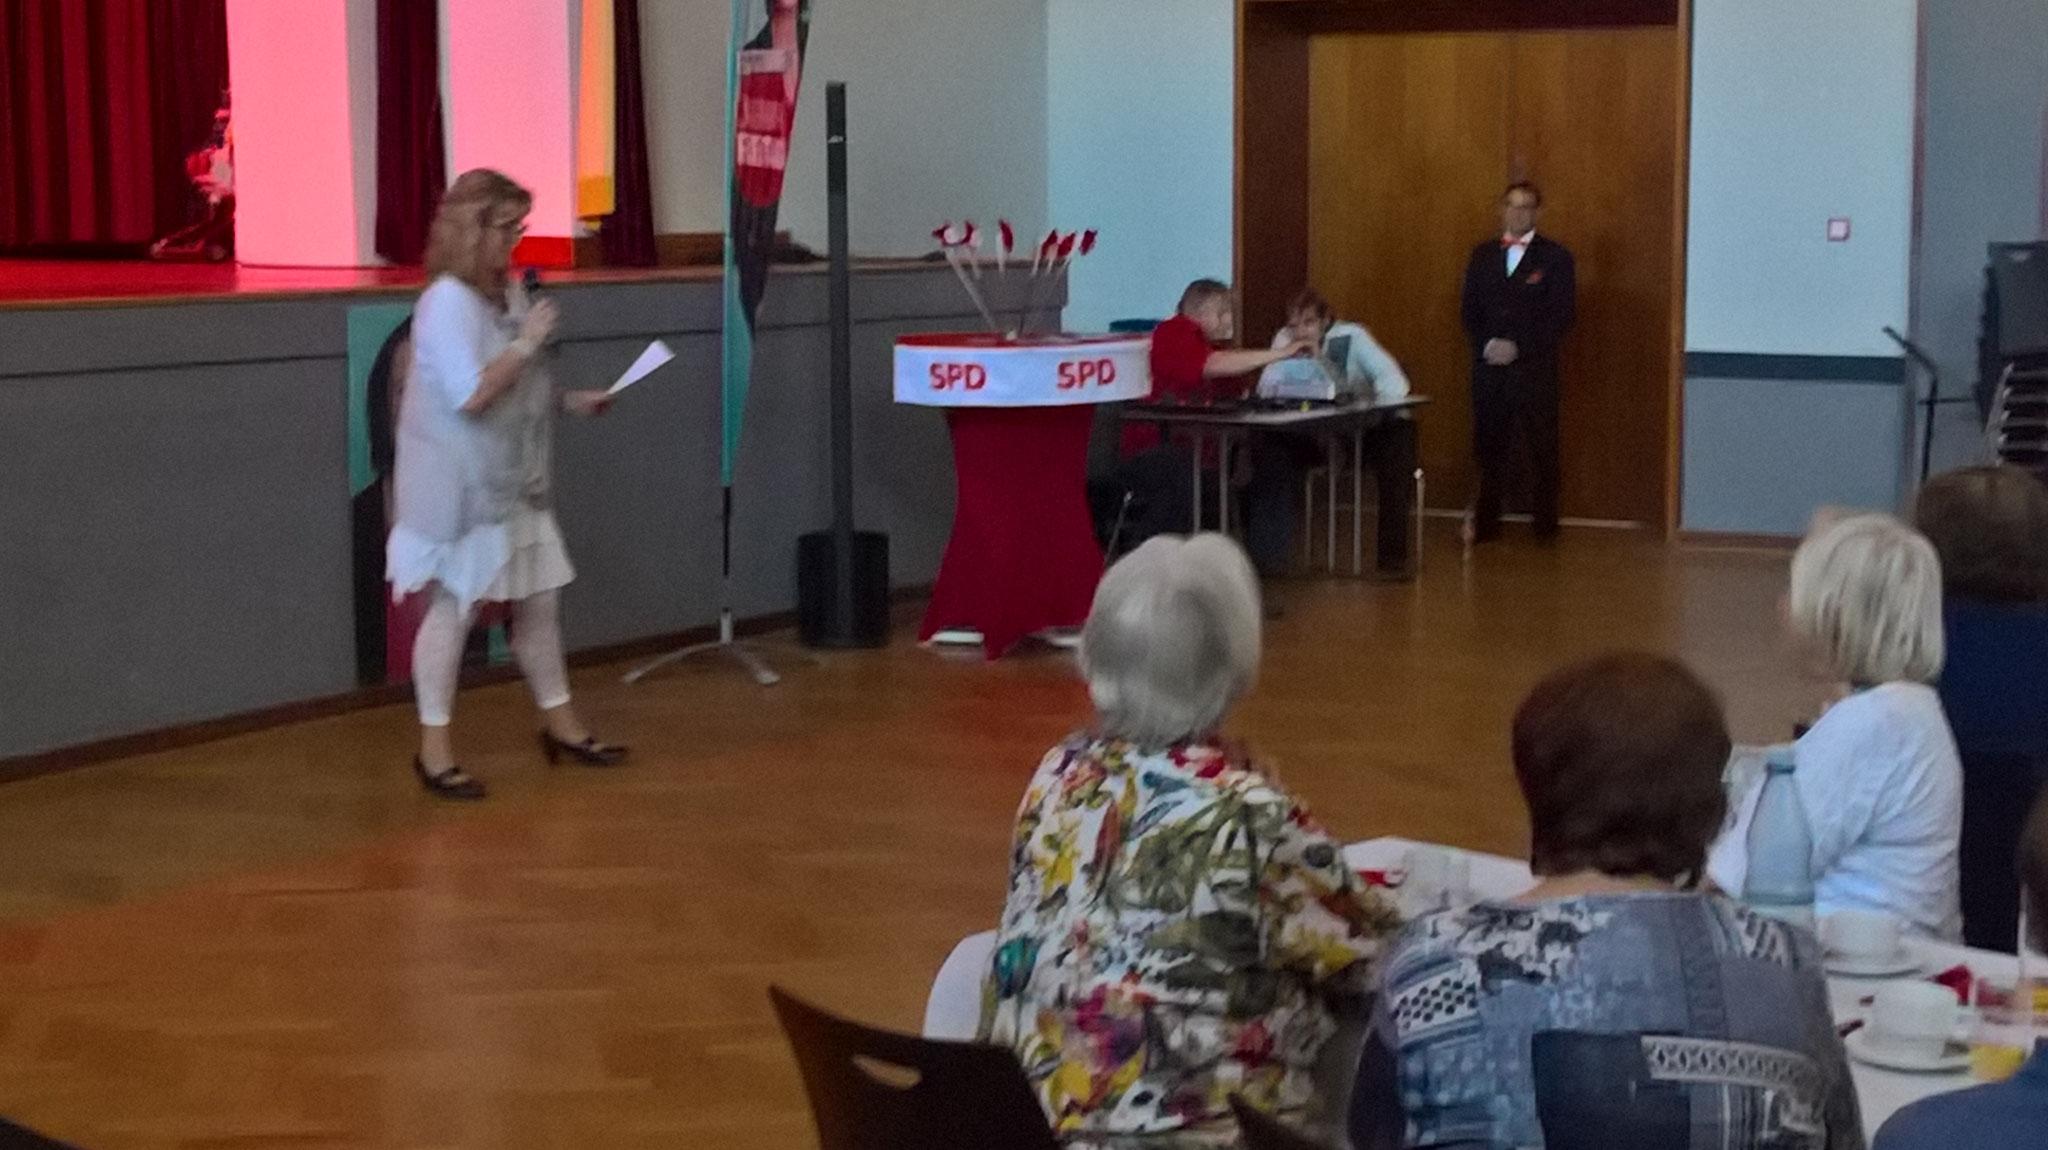 Martina Matner-Kißler eröffnet den Bunten Nachmittag